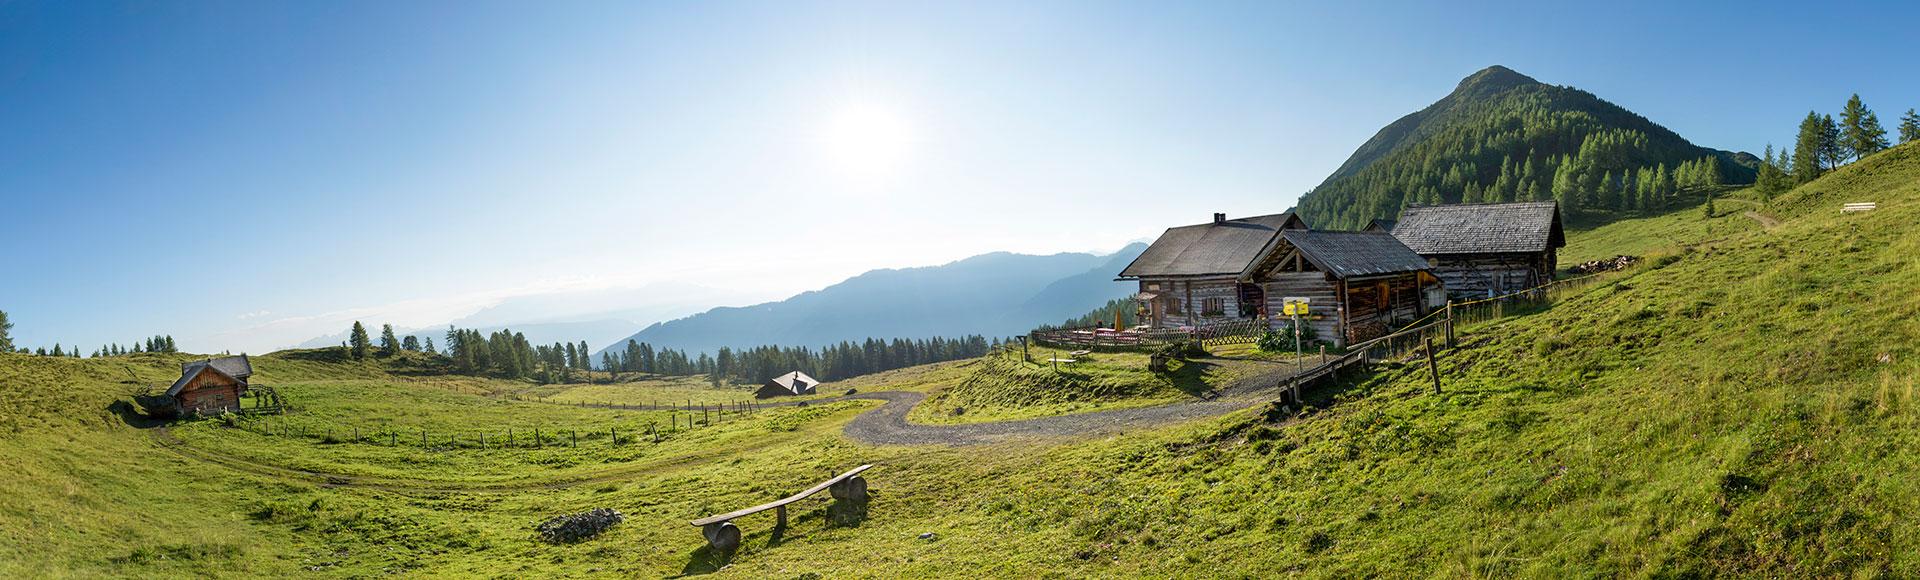 Sommerurlaub & Wanderurlaub in Flachau, Salzburg